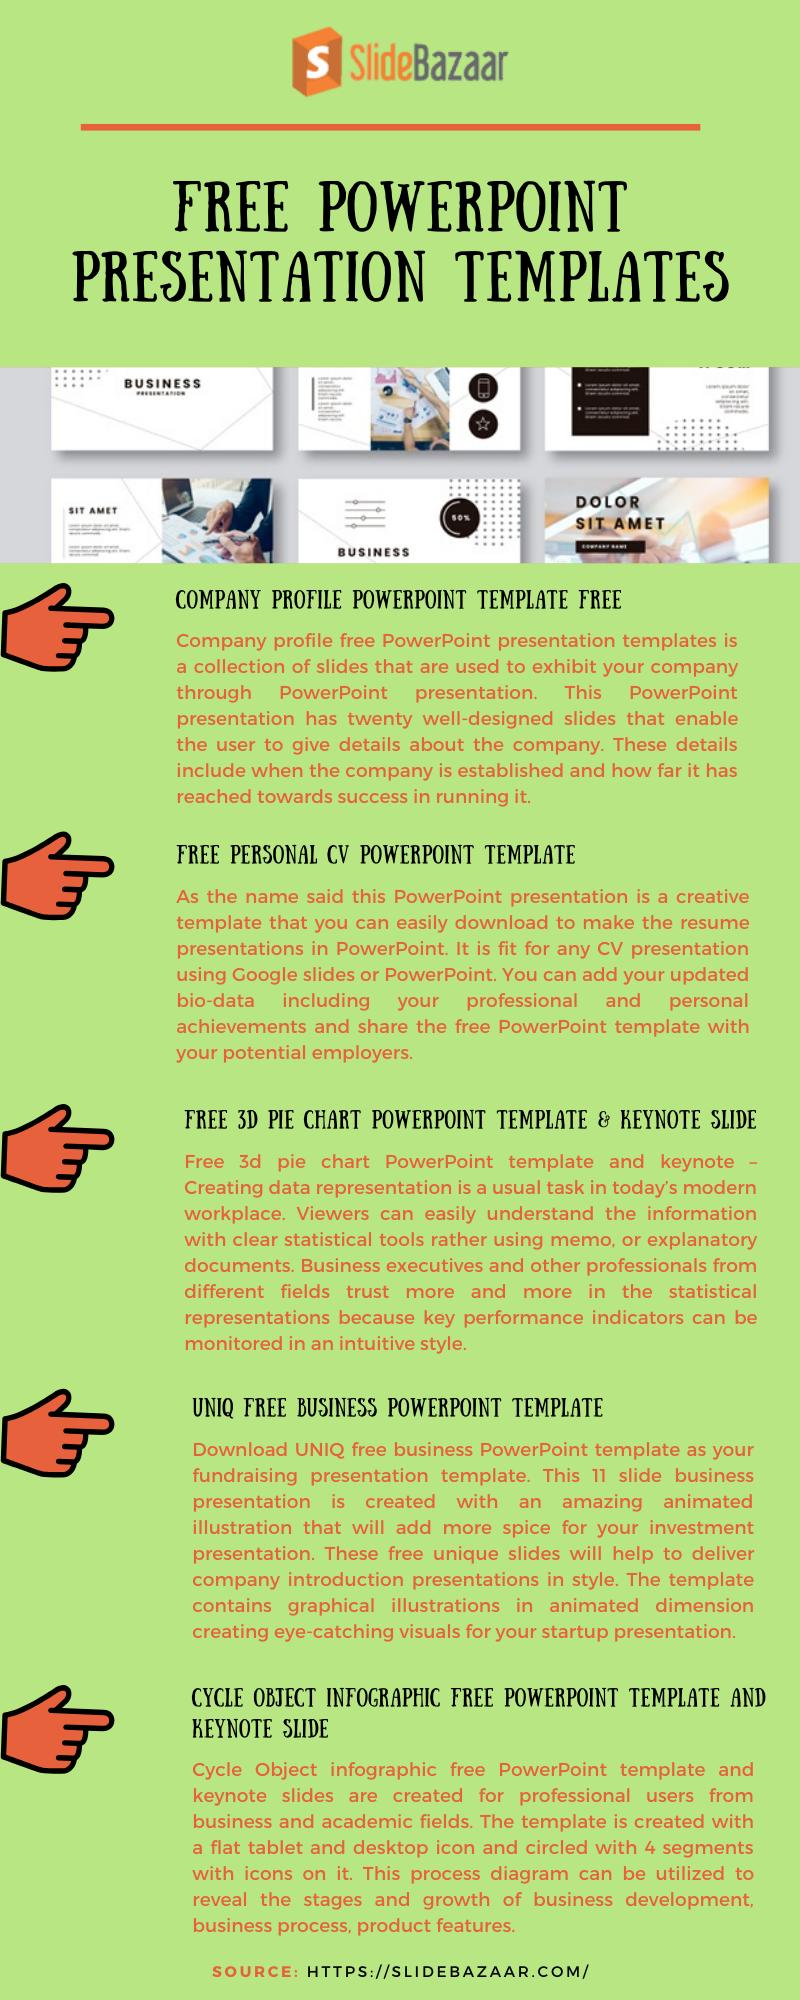 Free PowerPoint Presentation Templates